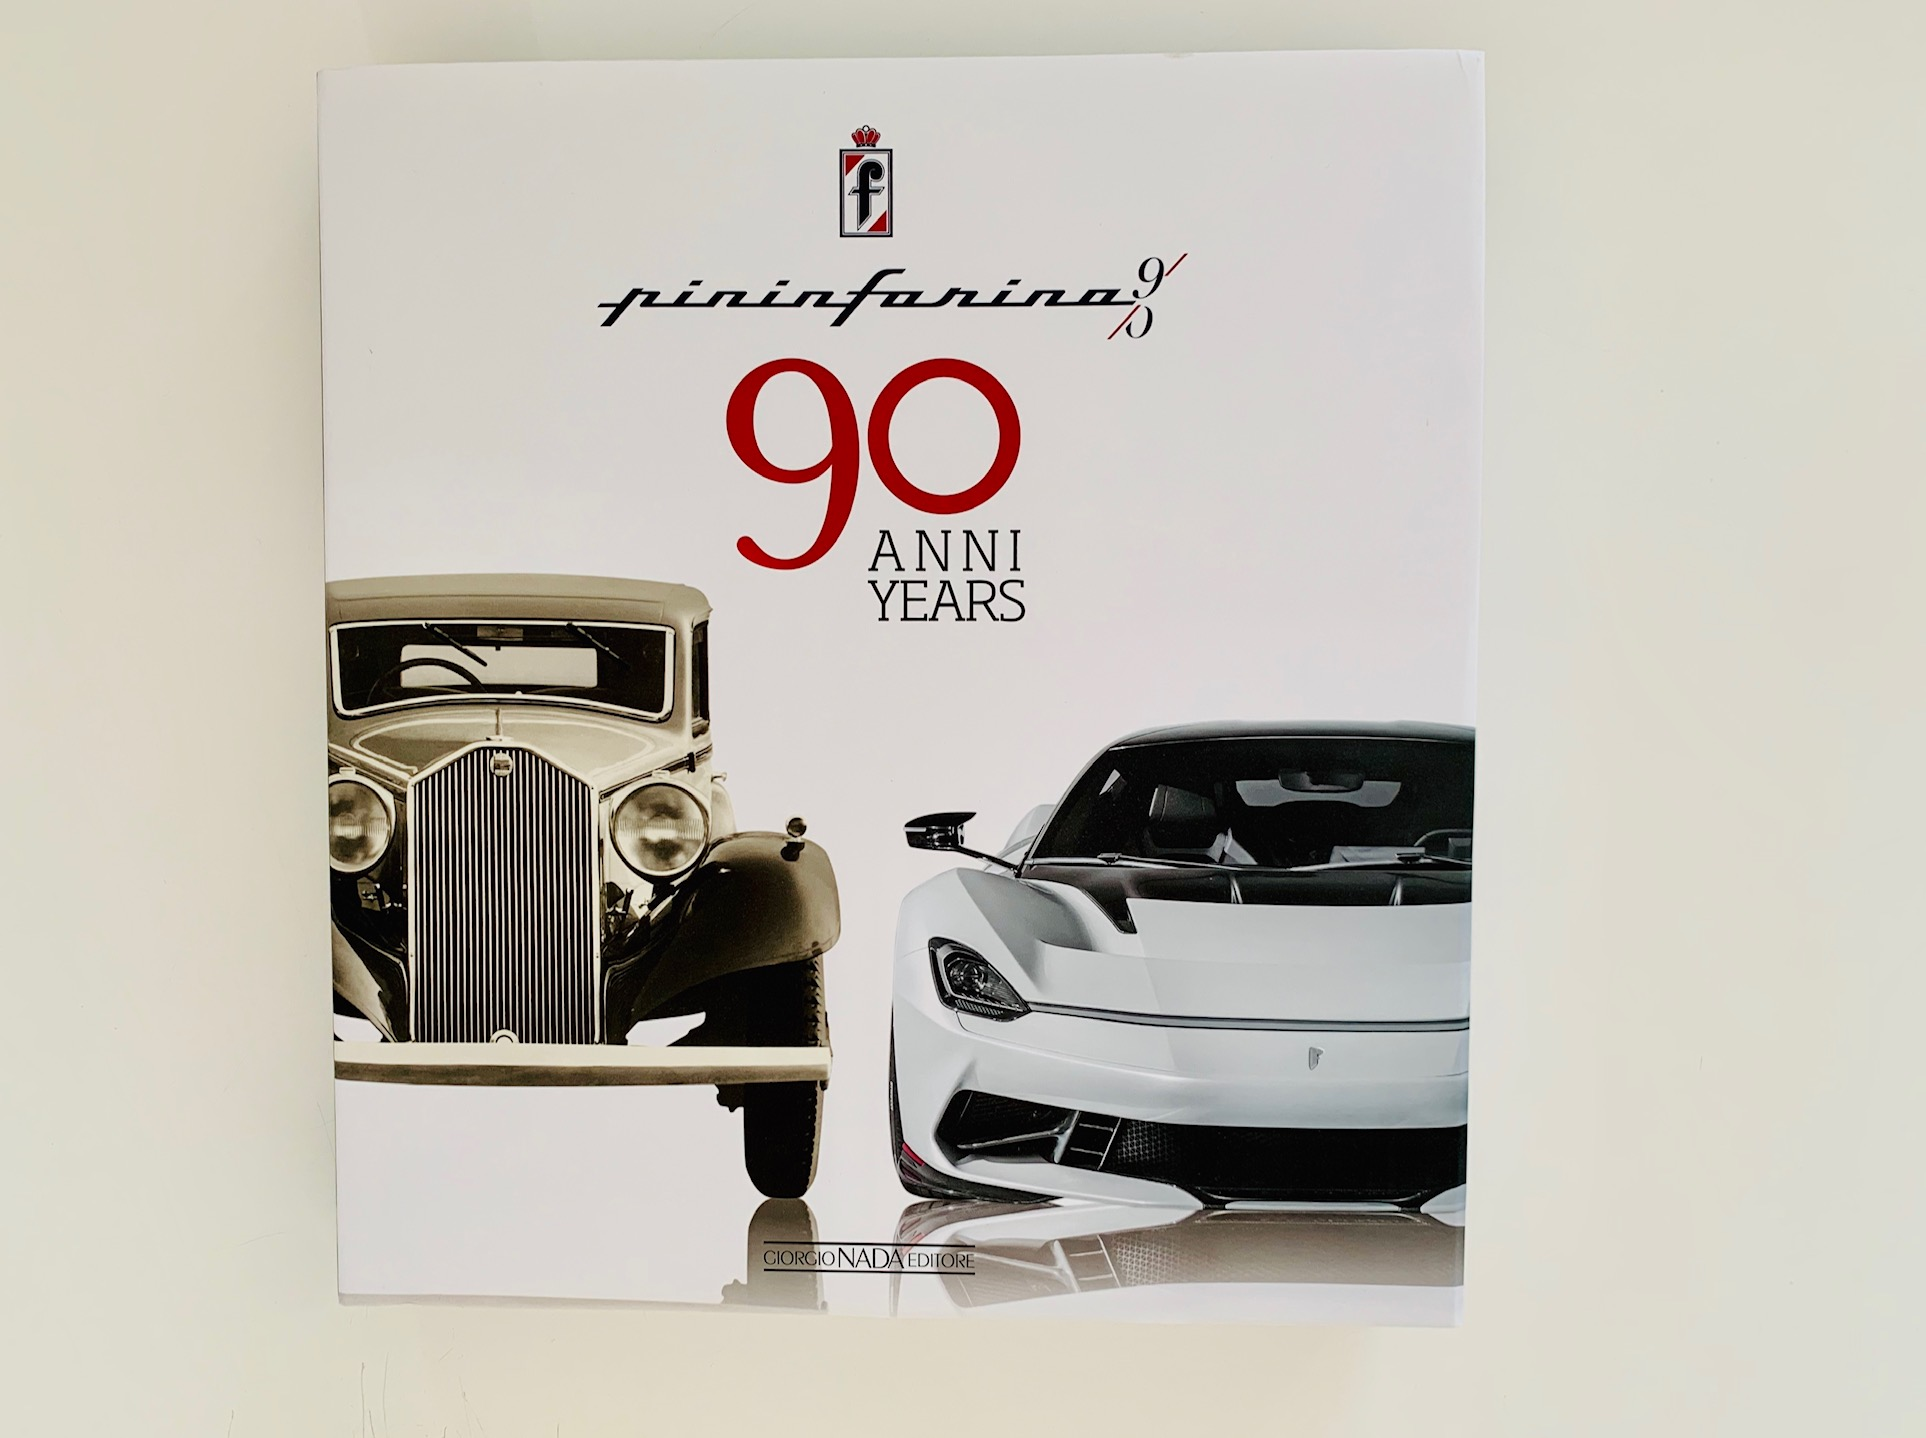 foto bild cover pininfarina 90 anni years